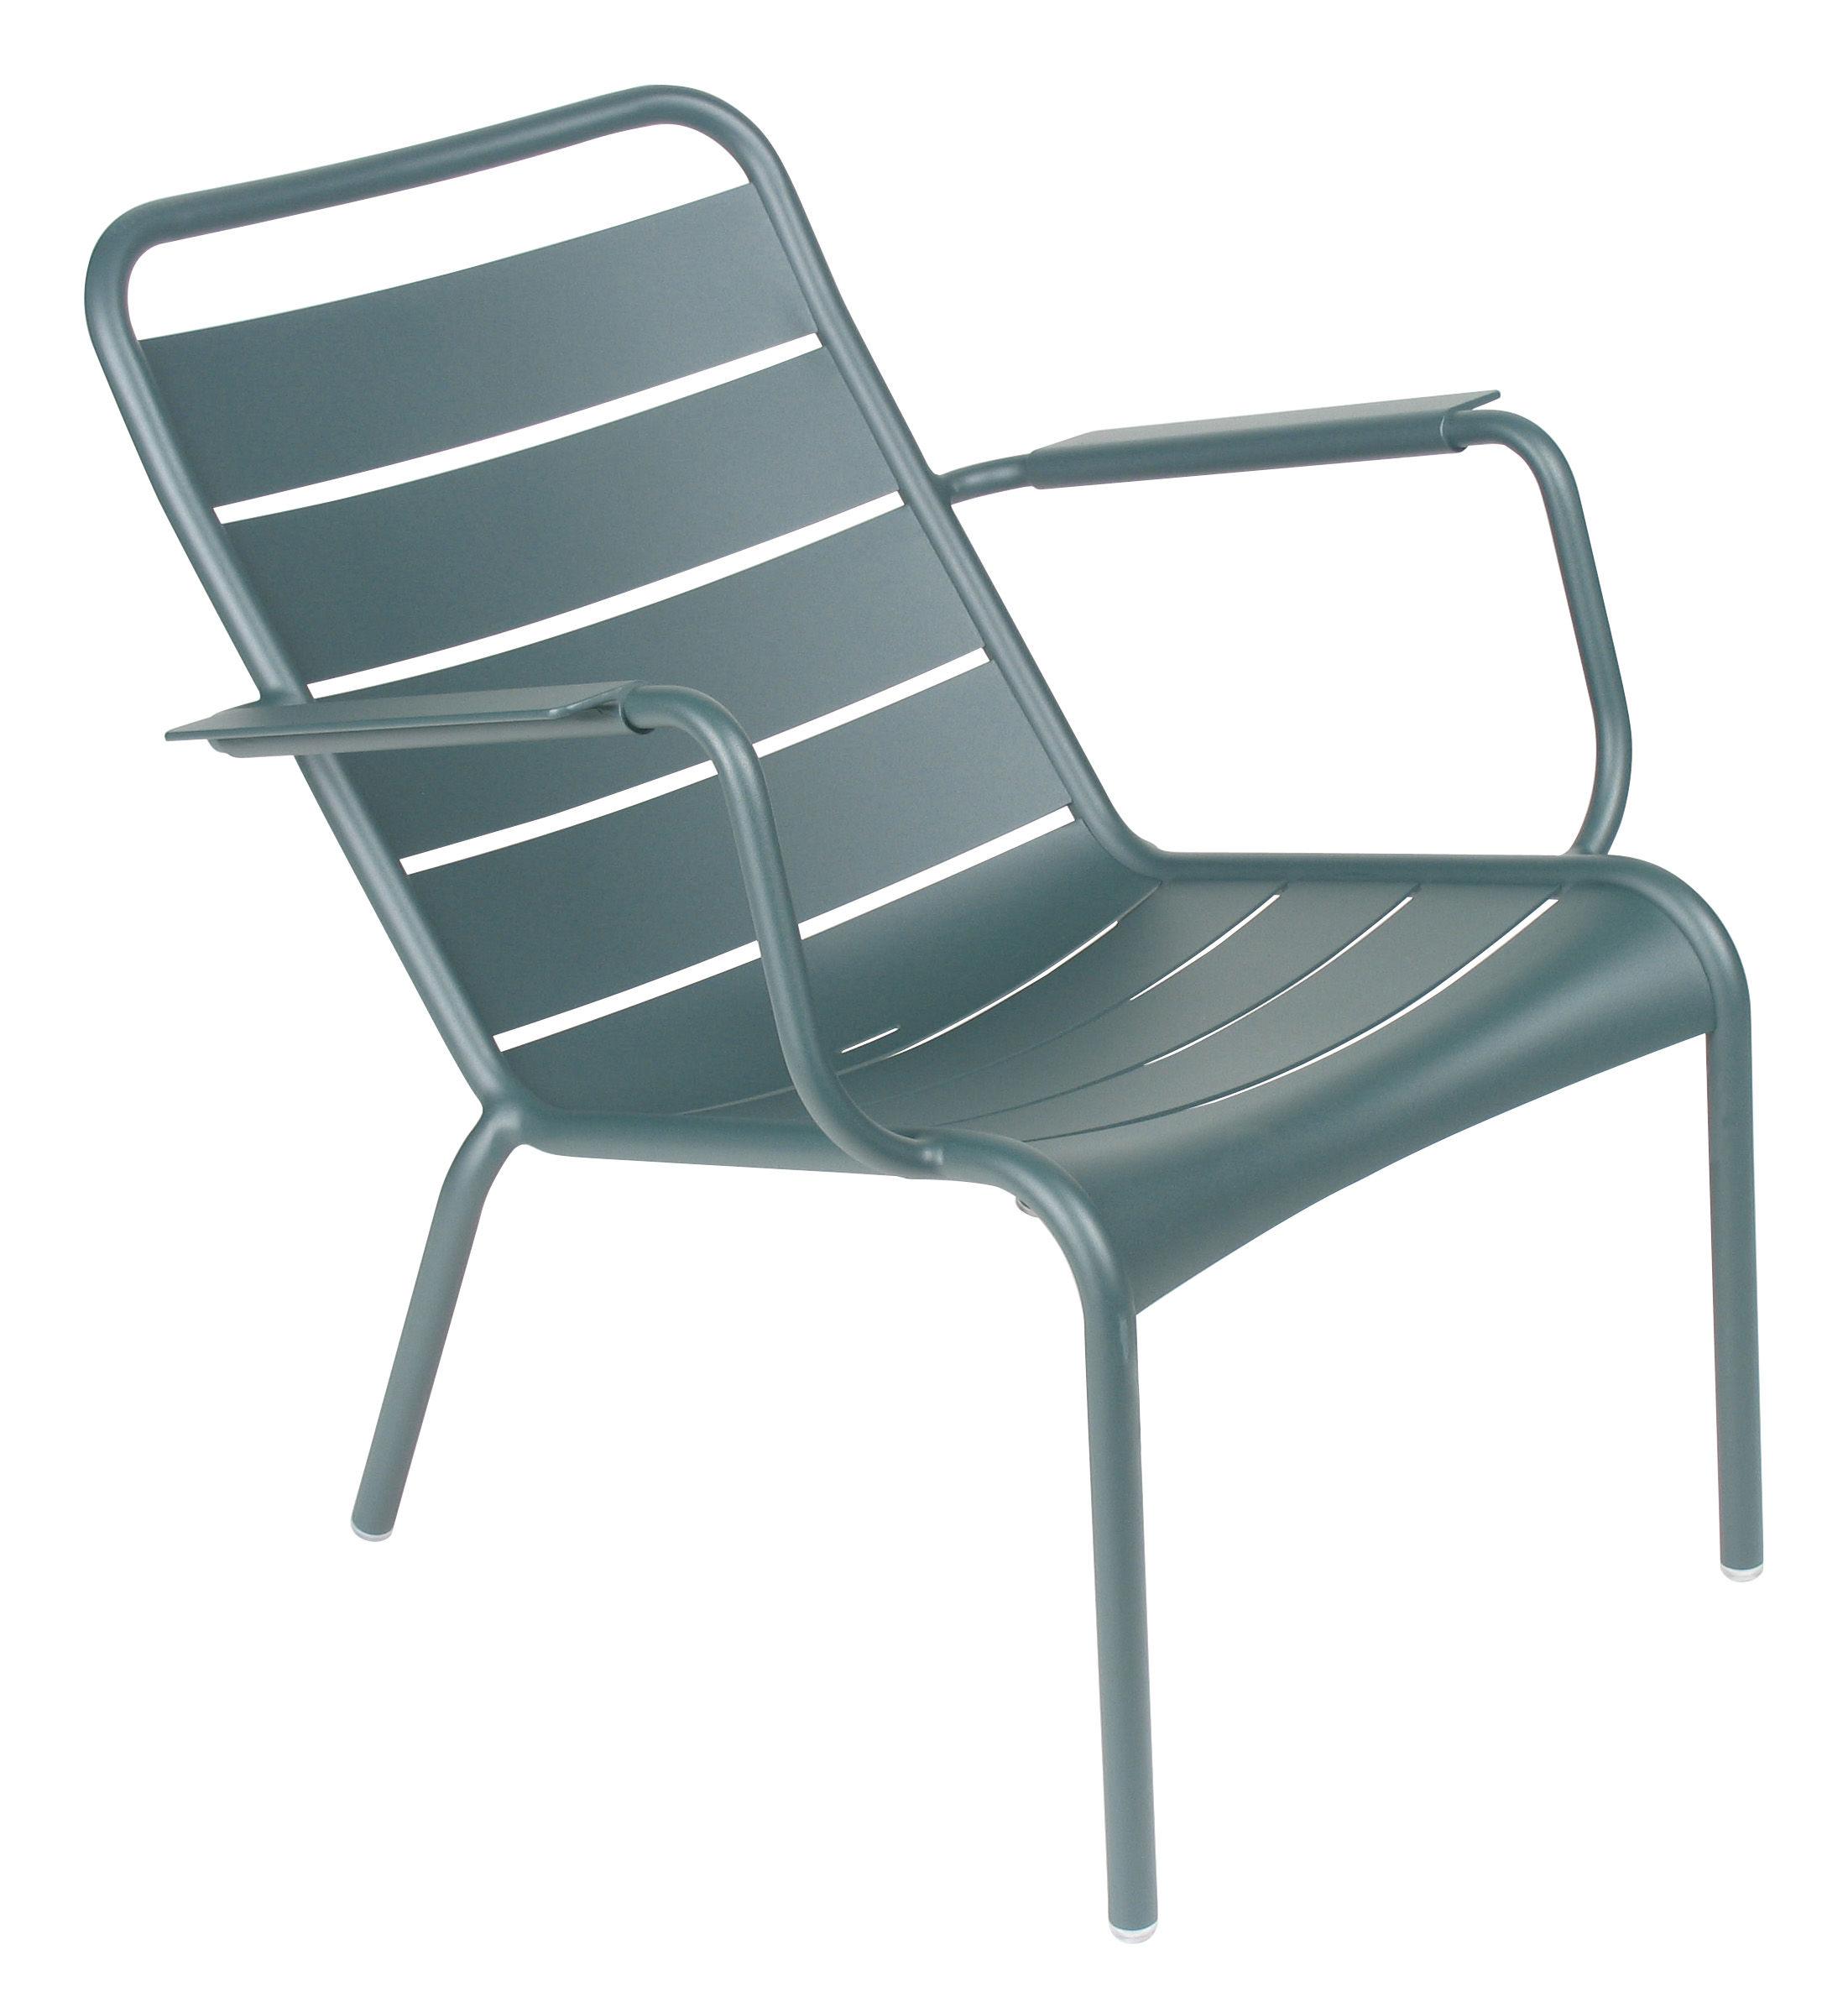 Life Style - Fauteuil bas Luxembourg / Aluminium - Fermob - Cédre - Aluminium laqué